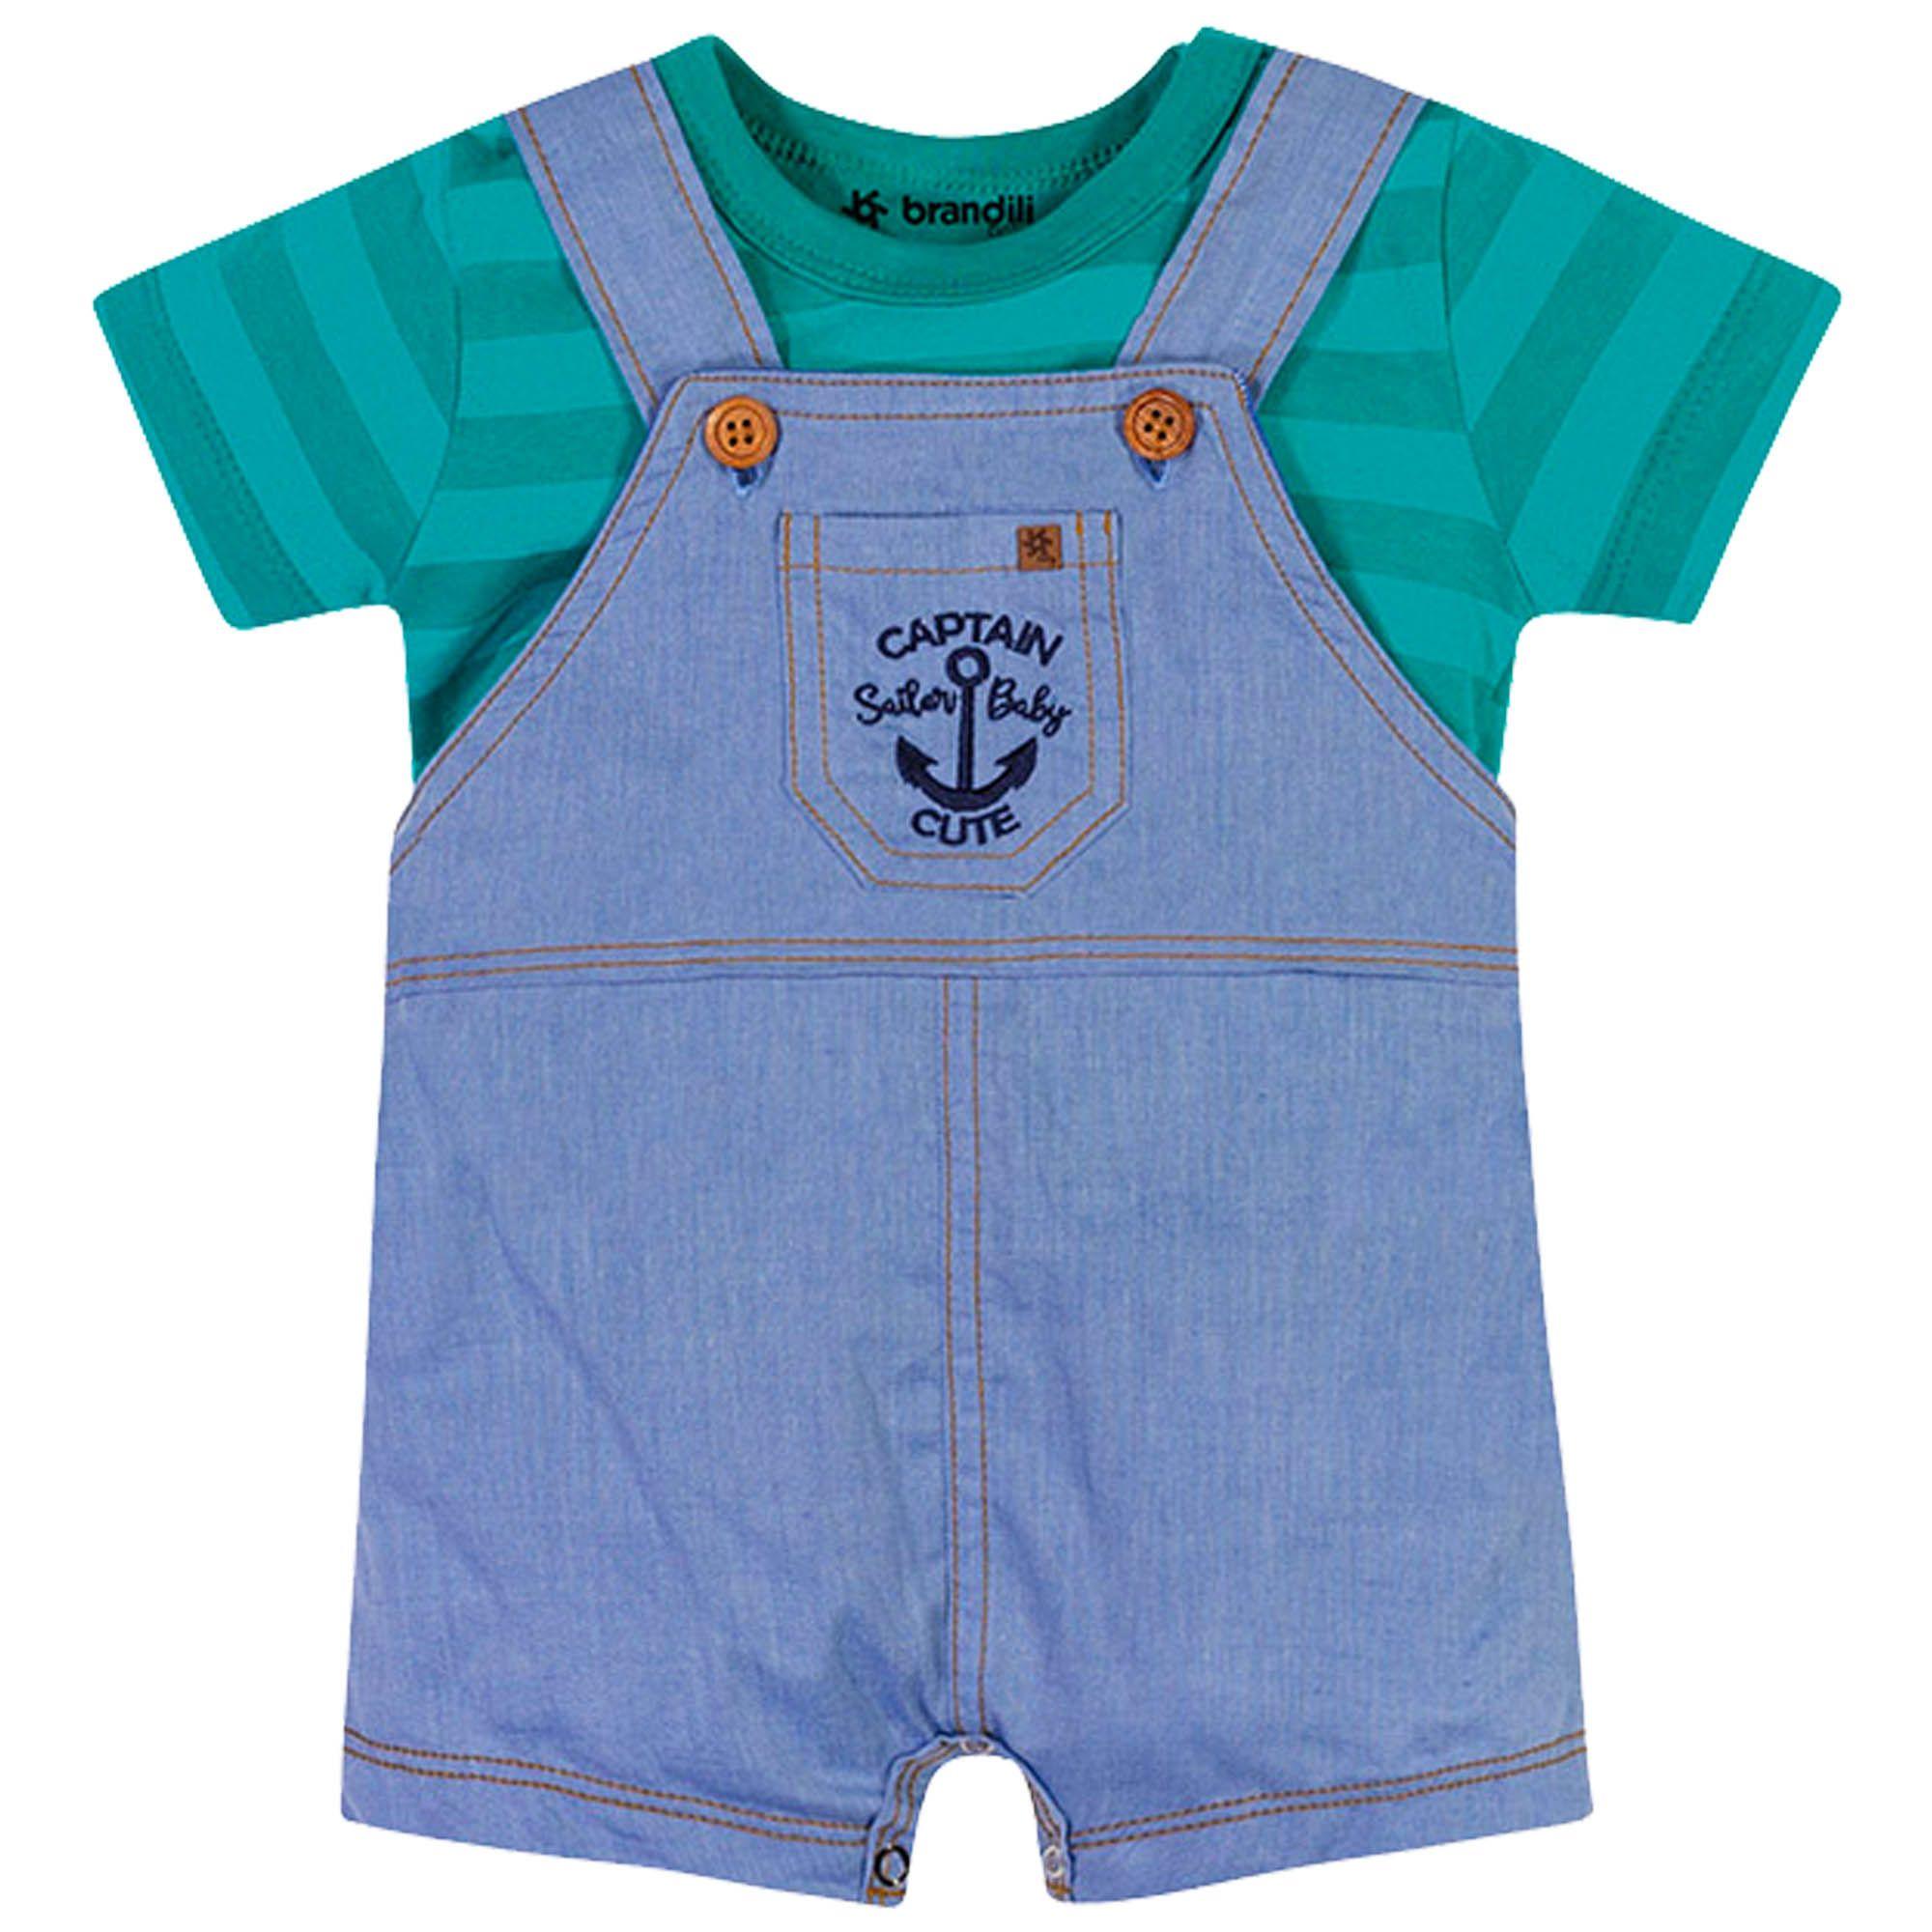 Conjunto Brandili Baby Jardineira Captain Sailor Baby Cute - P ao G